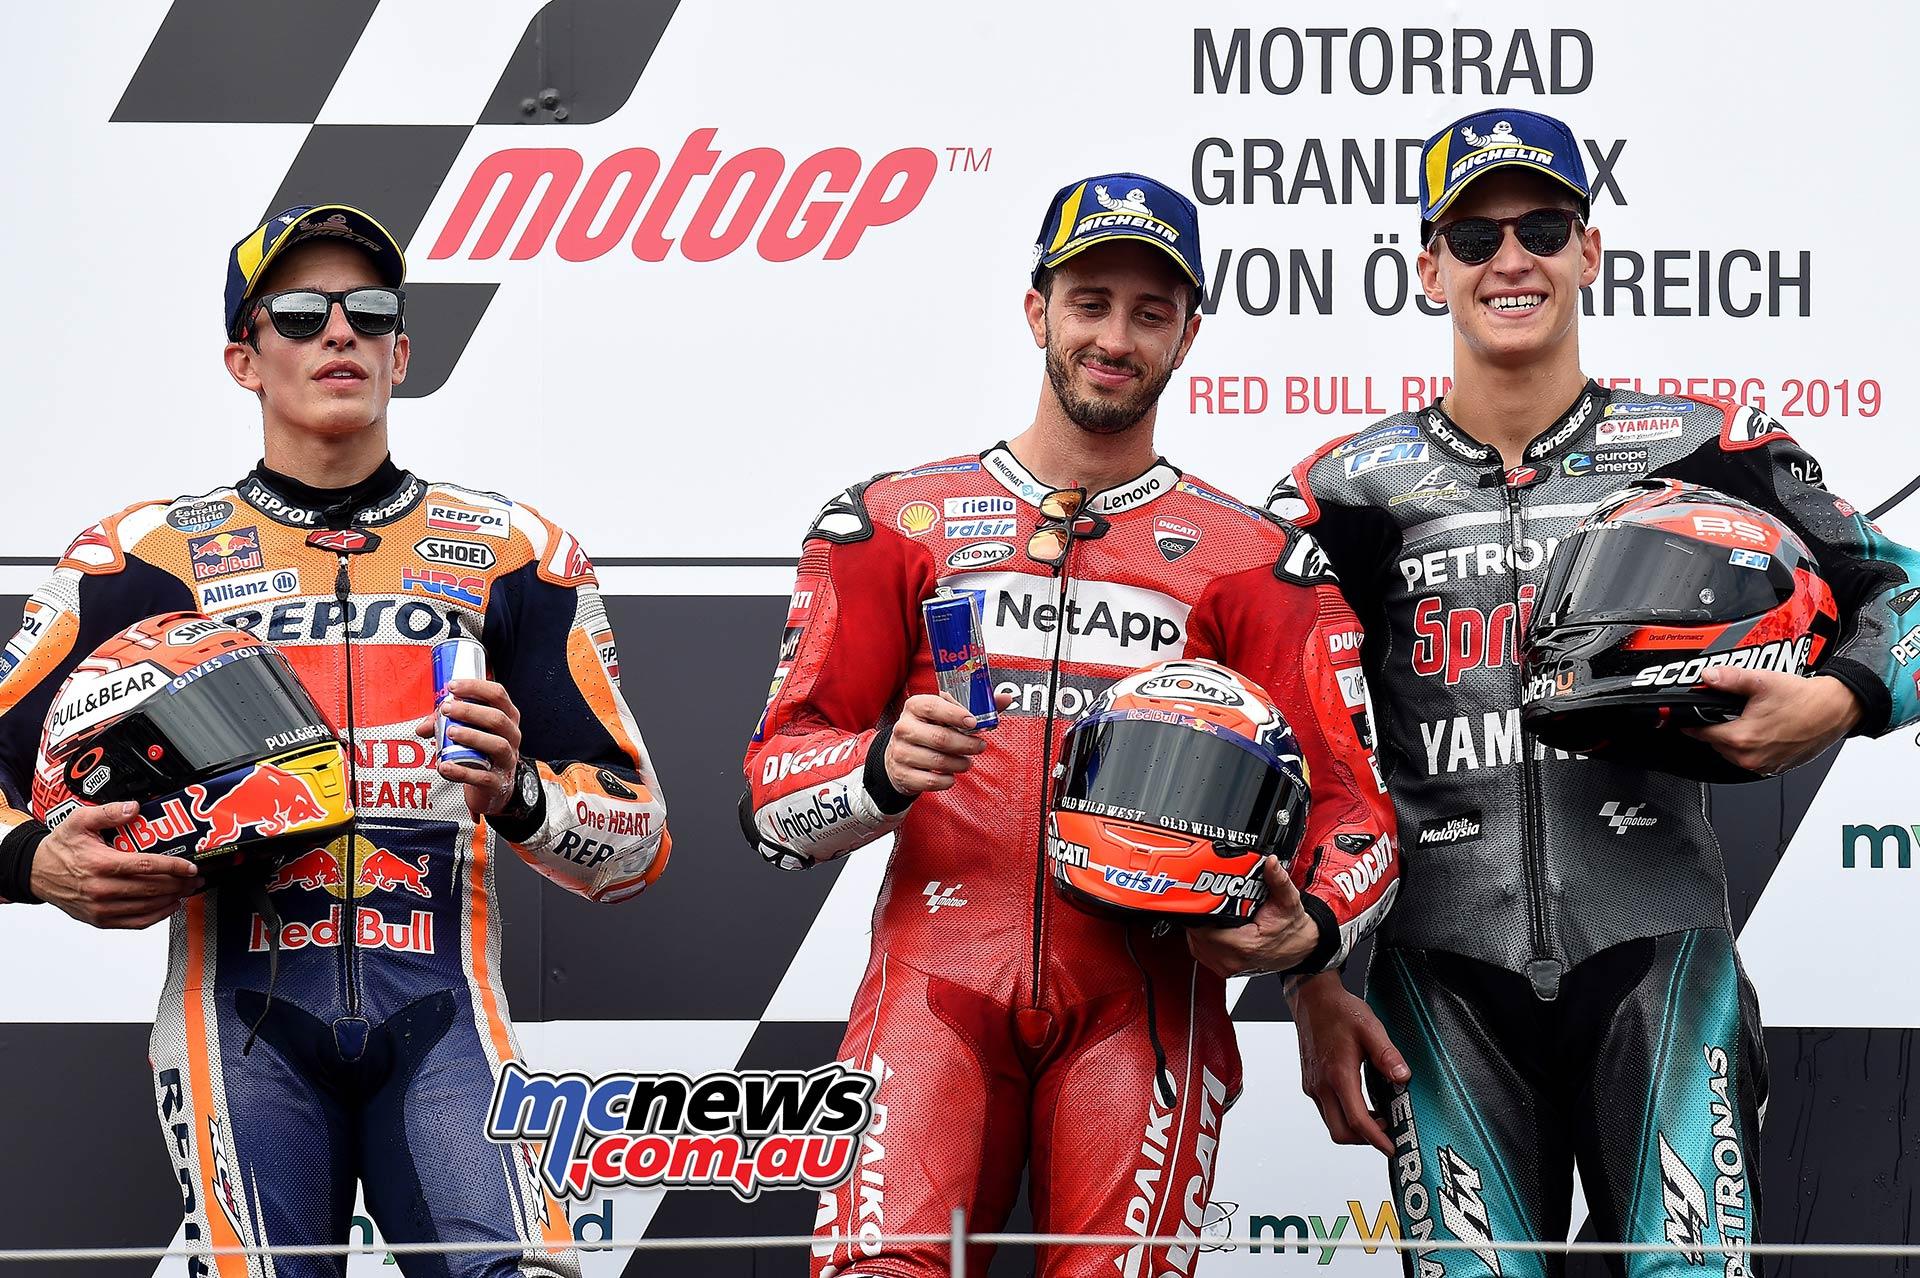 2019-motogp-rnd11-redbullring-race-podium-dovizioso-marquez-quartararo.jpg